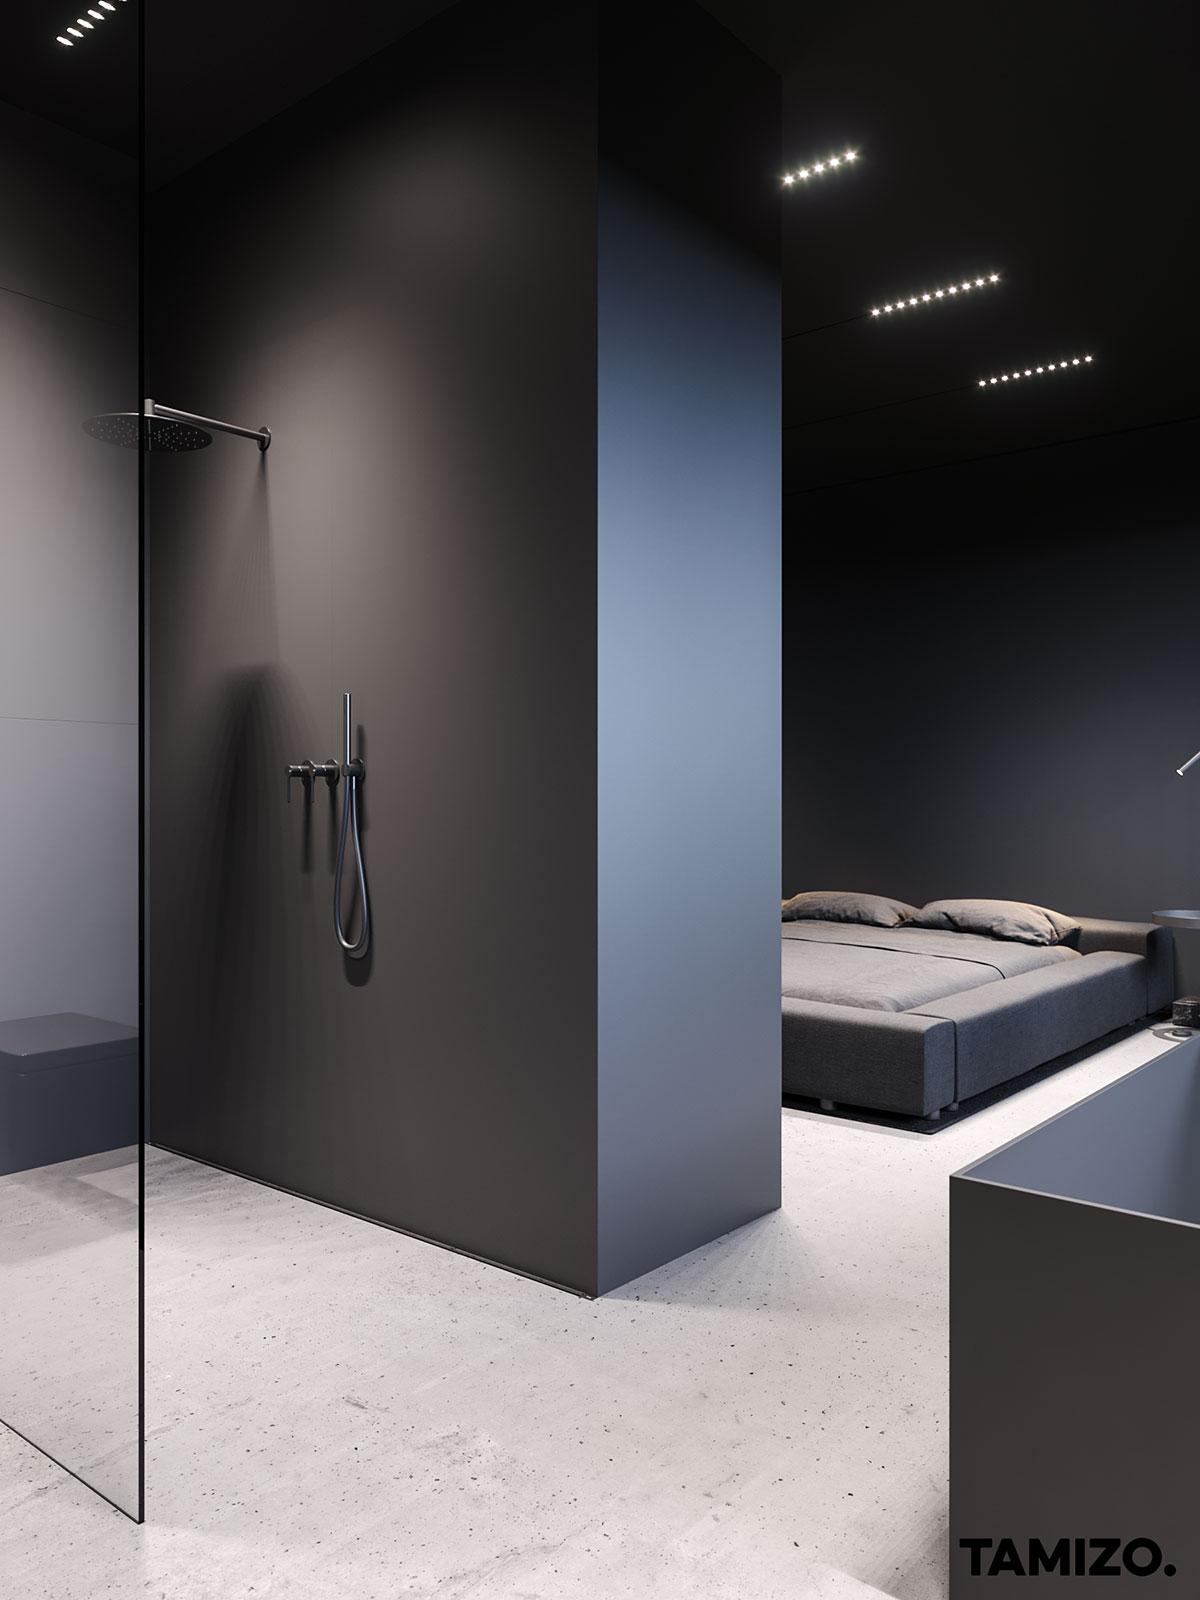 tamizo_architects_mateusz_kuo_stolarski_poznan_iterior_design_apartment_penthouse_12